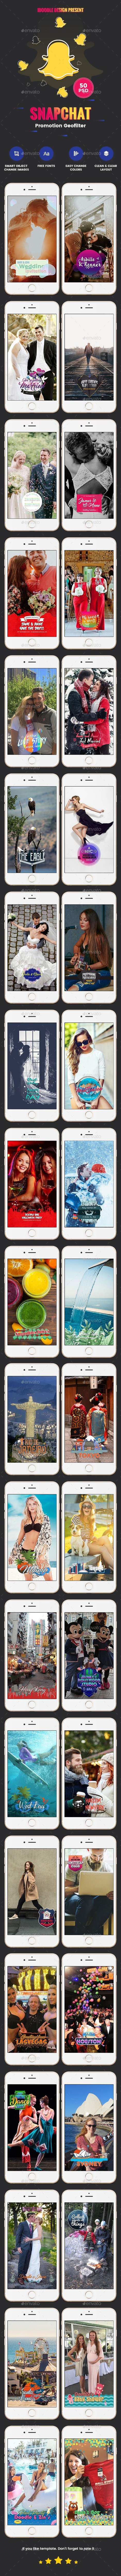 bundle promotion geofilters snapchat 50 psd snapchat promotion